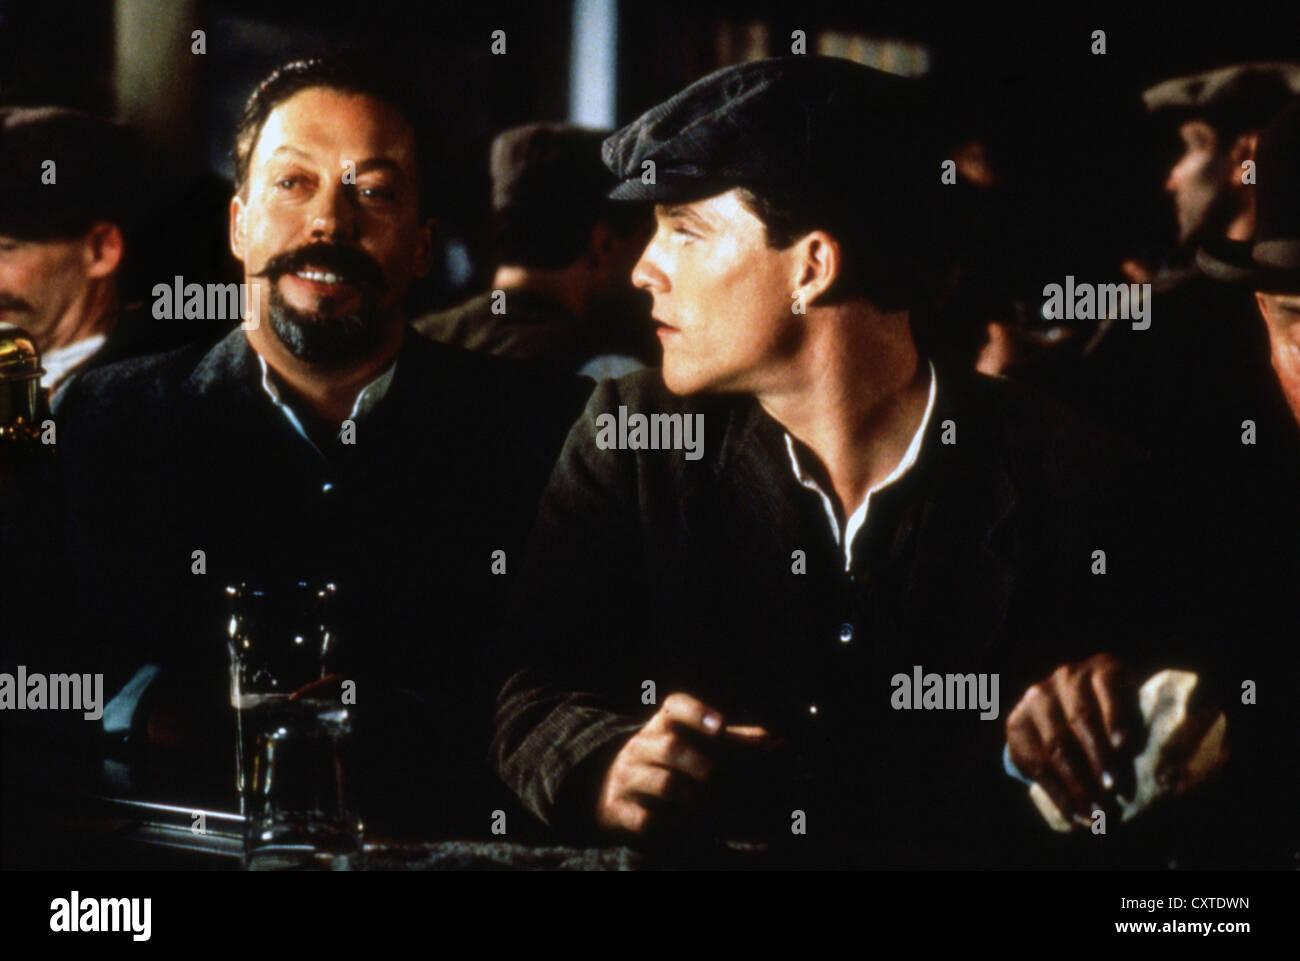 TITANIC (1996) TIM CURRY, ROBERT LIEBERMAN (DIR) TTNC 004 MOVIESTORE COLLECTION LTD - Stock Image